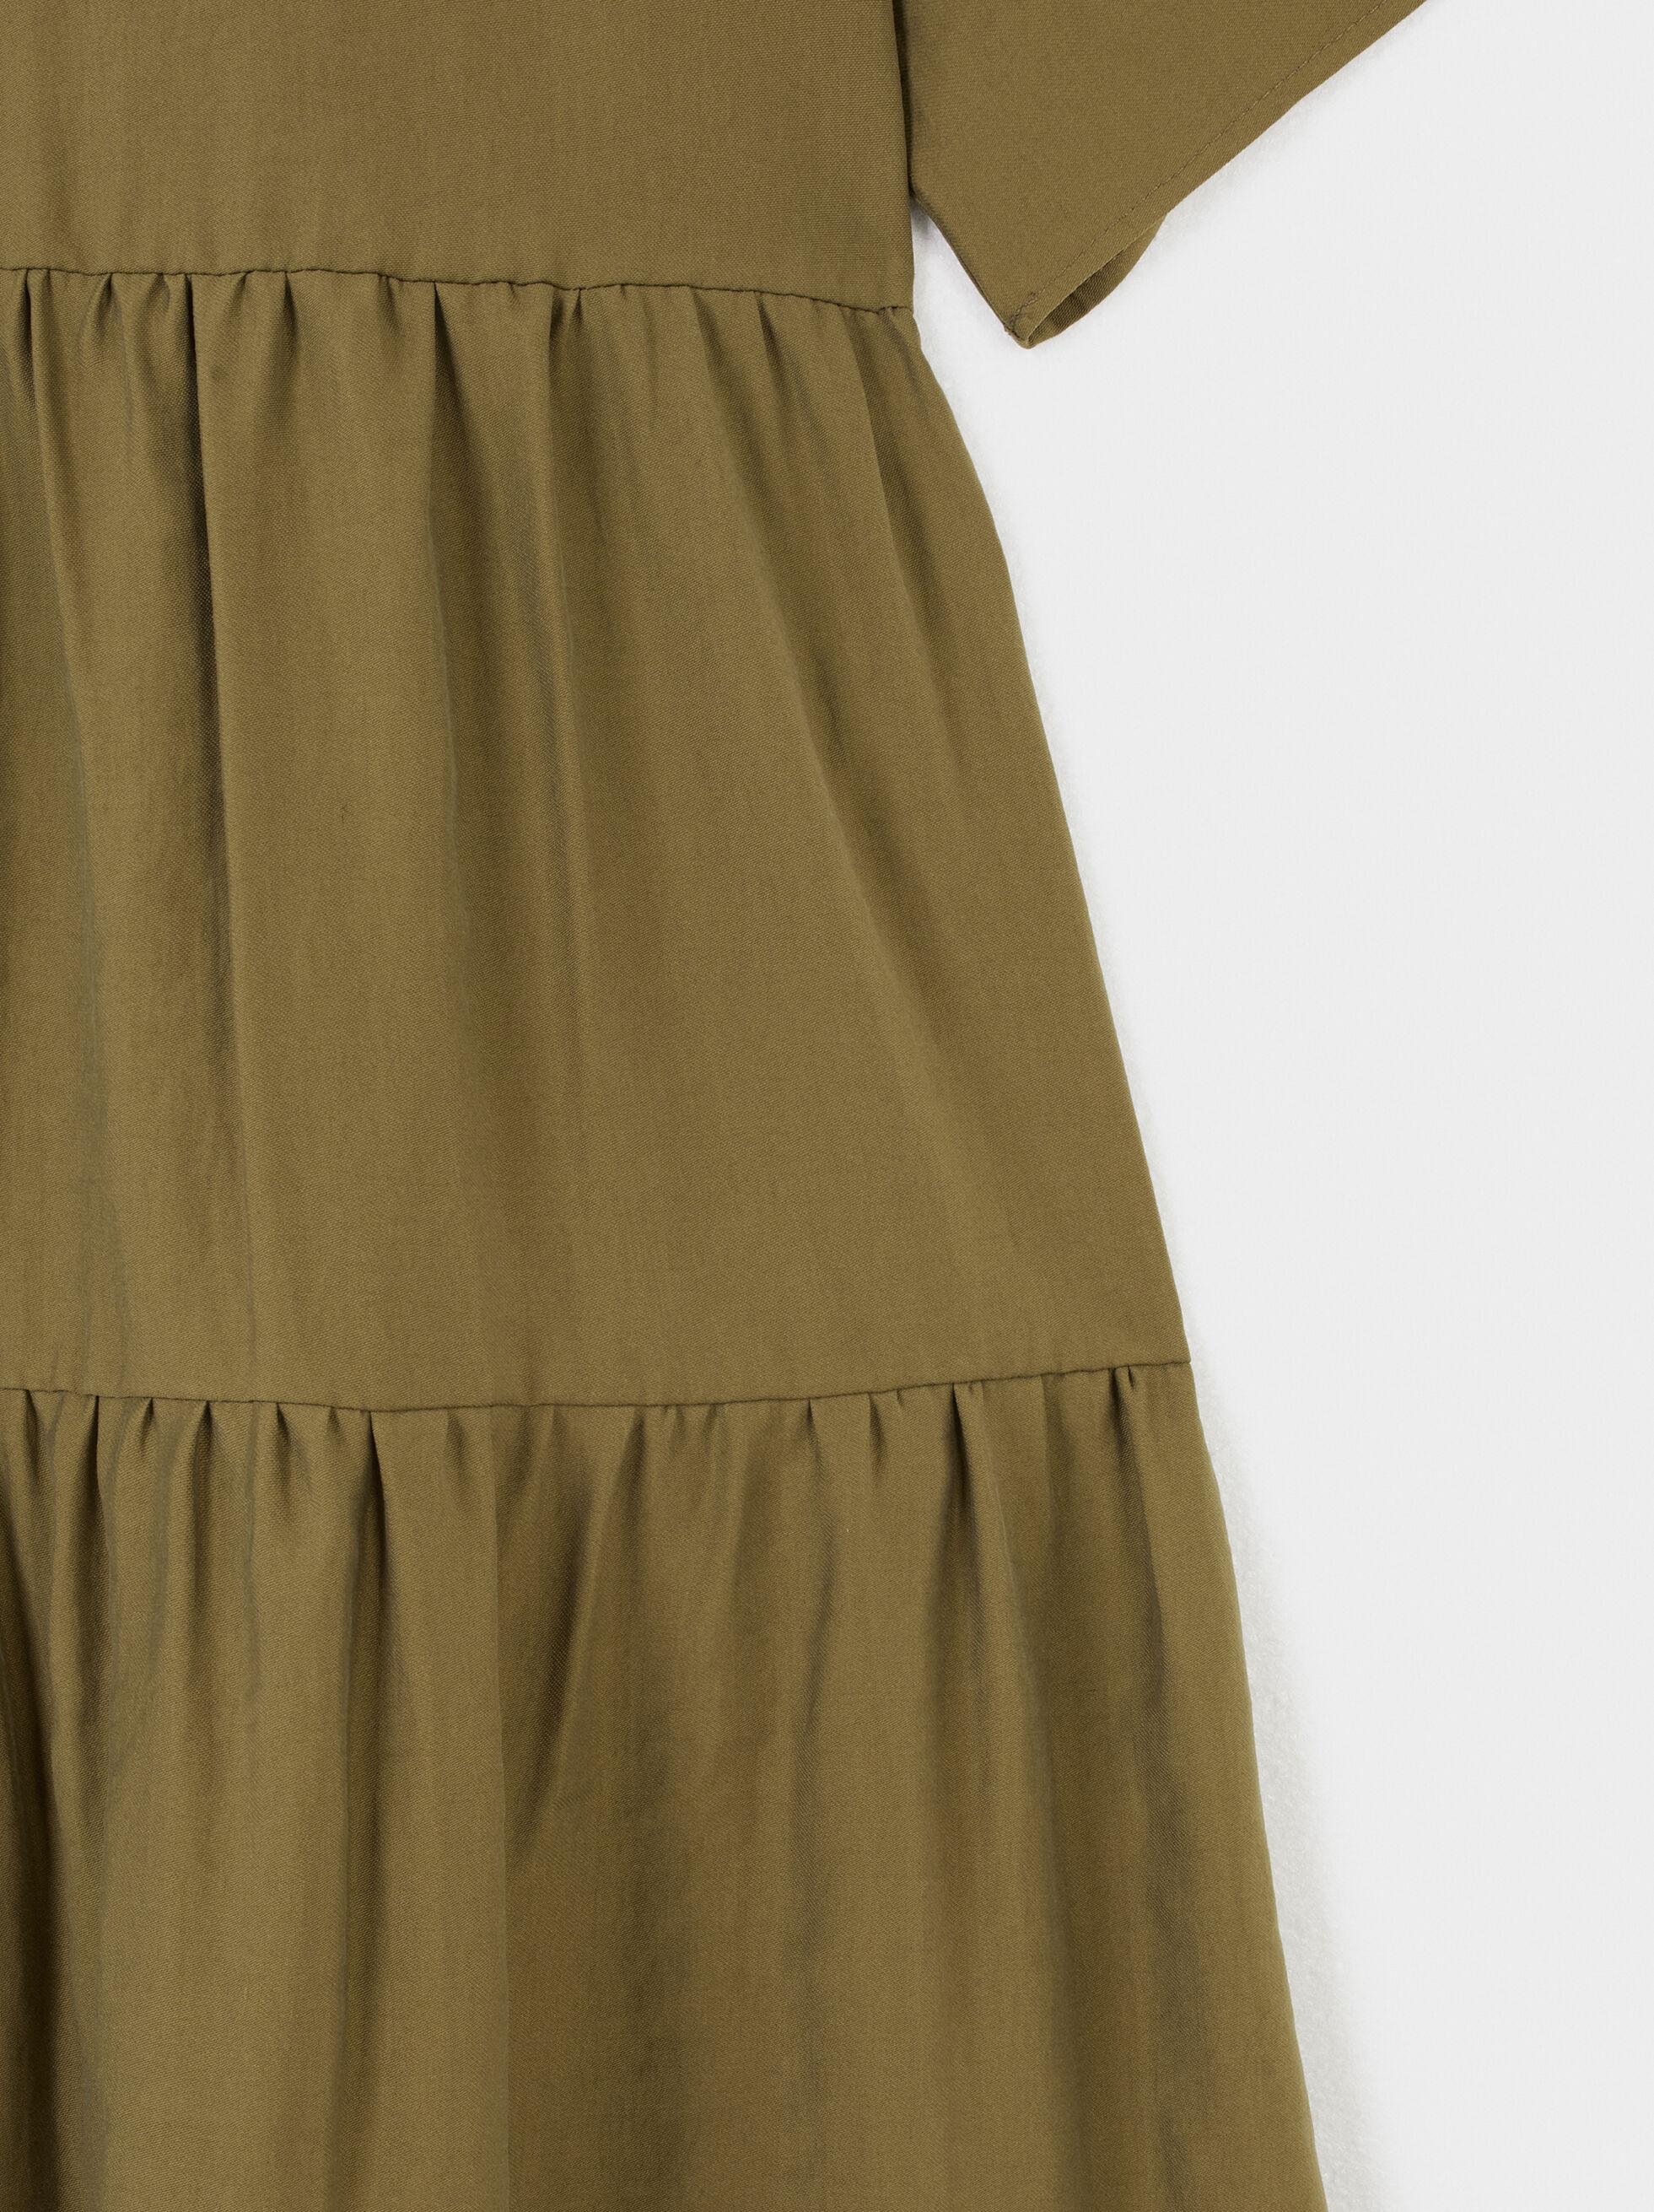 Vestido Escote Pico, Caqui, hi-res